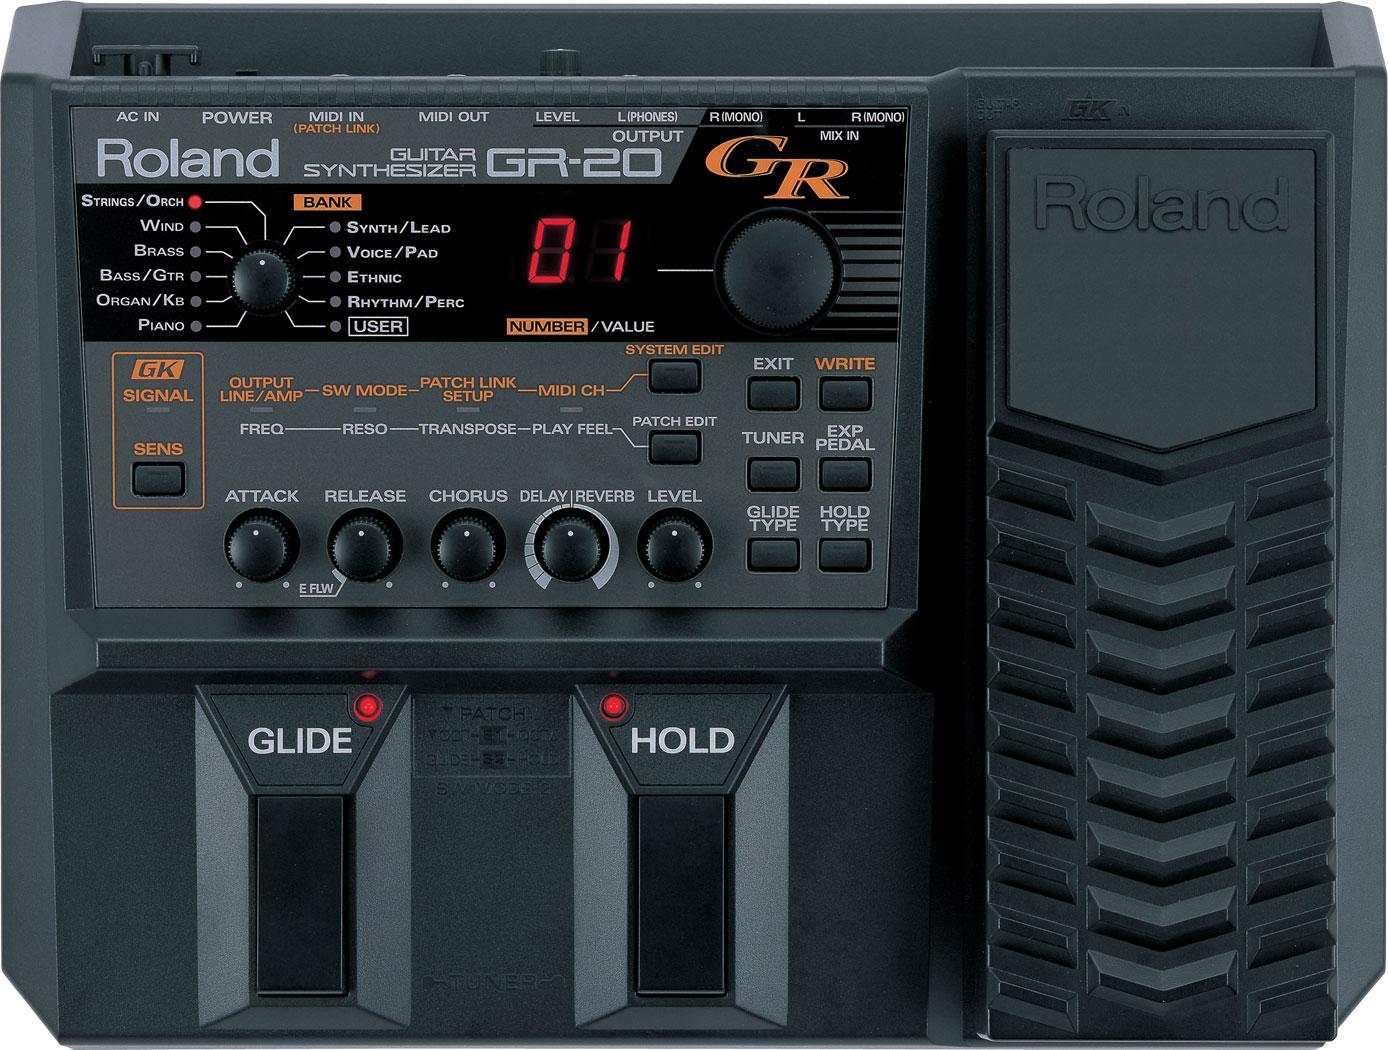 Roland Gr 20 Guitar Synthesizer Mini Audio Signal Generator Online Repair Manual